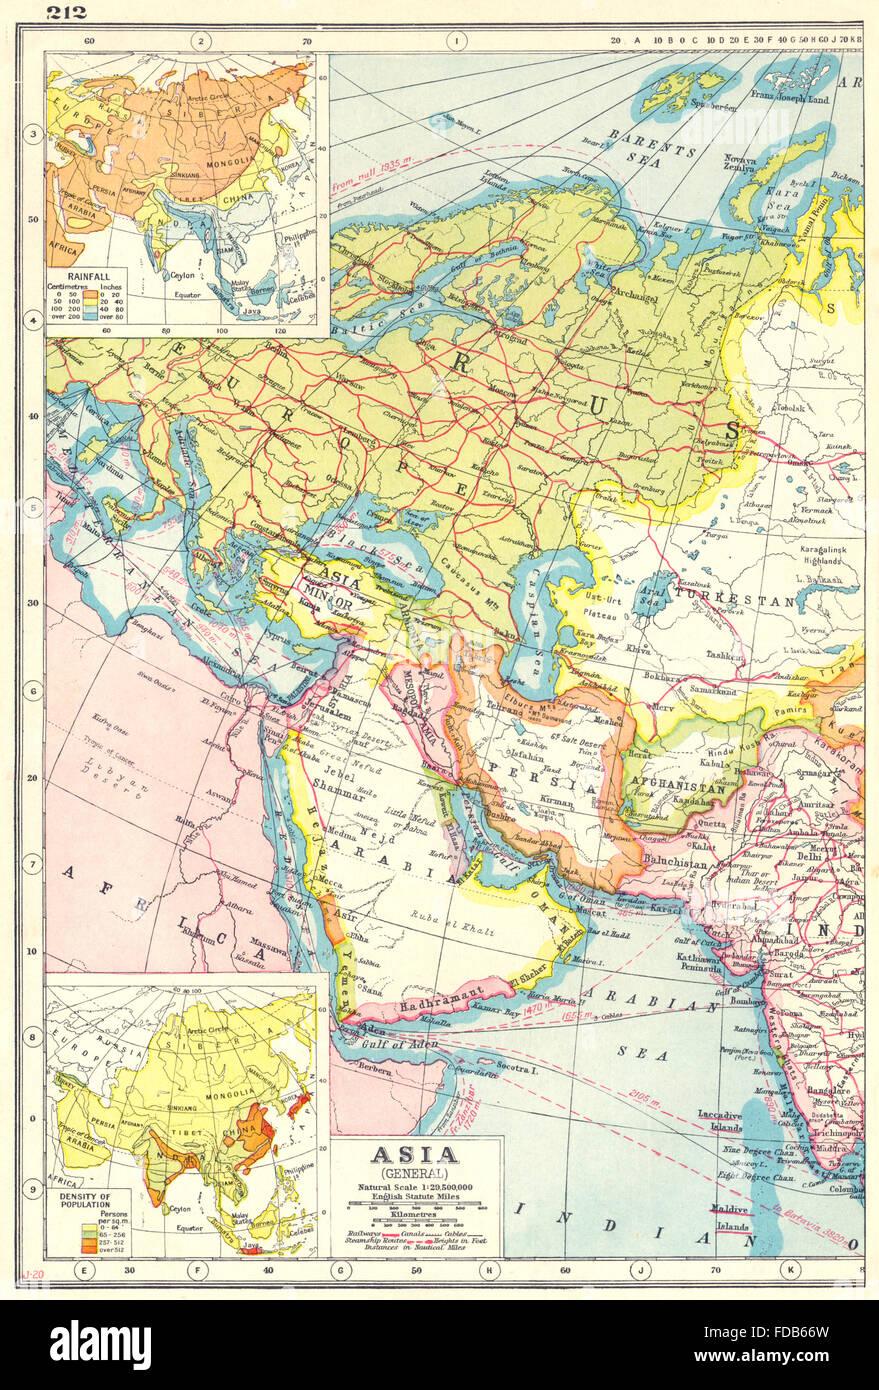 WEST ASIAArabia Persia Mesopotamia RussiaRainfall population